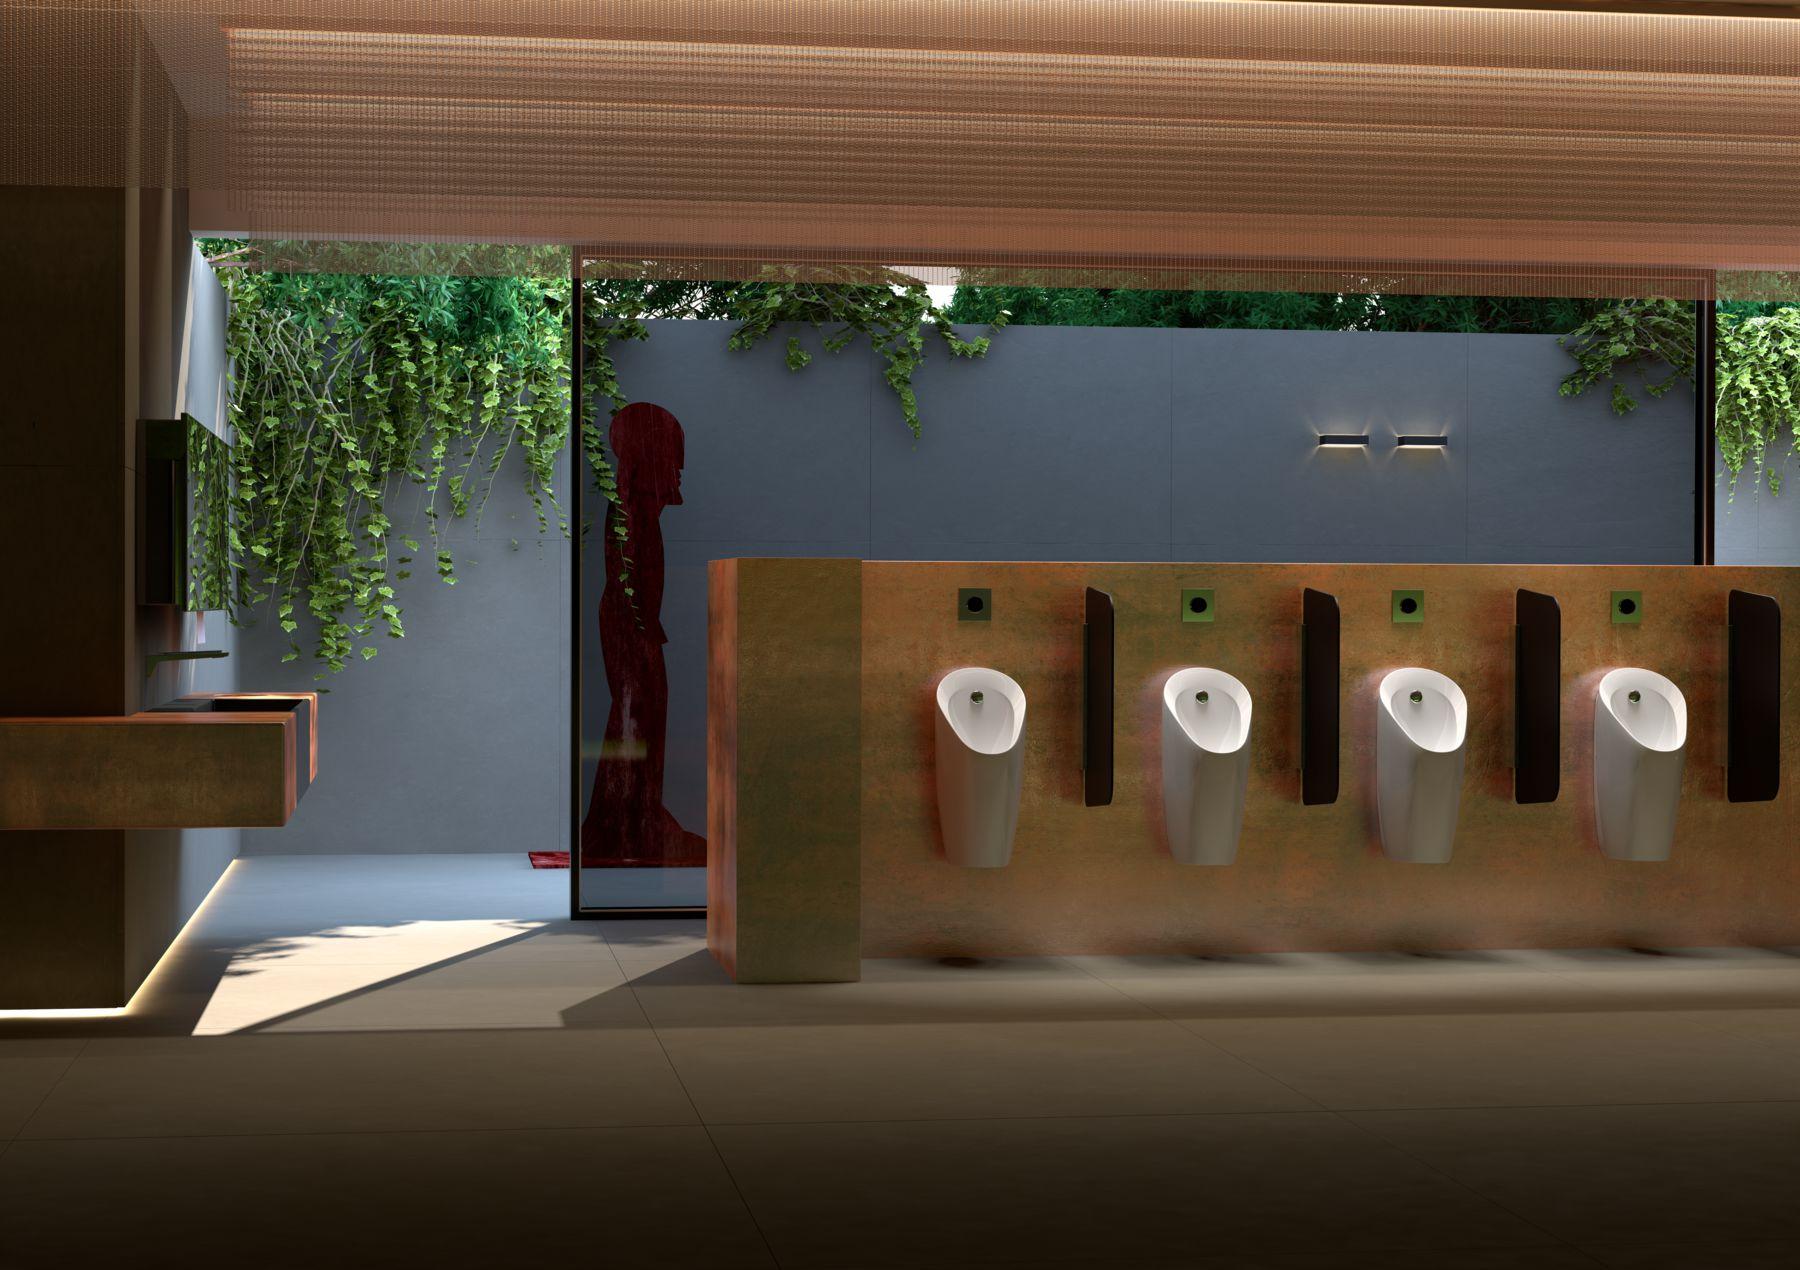 2016 Bathroom 08 C Urinal Preda with concealed control.tif_bigview_${04950848}